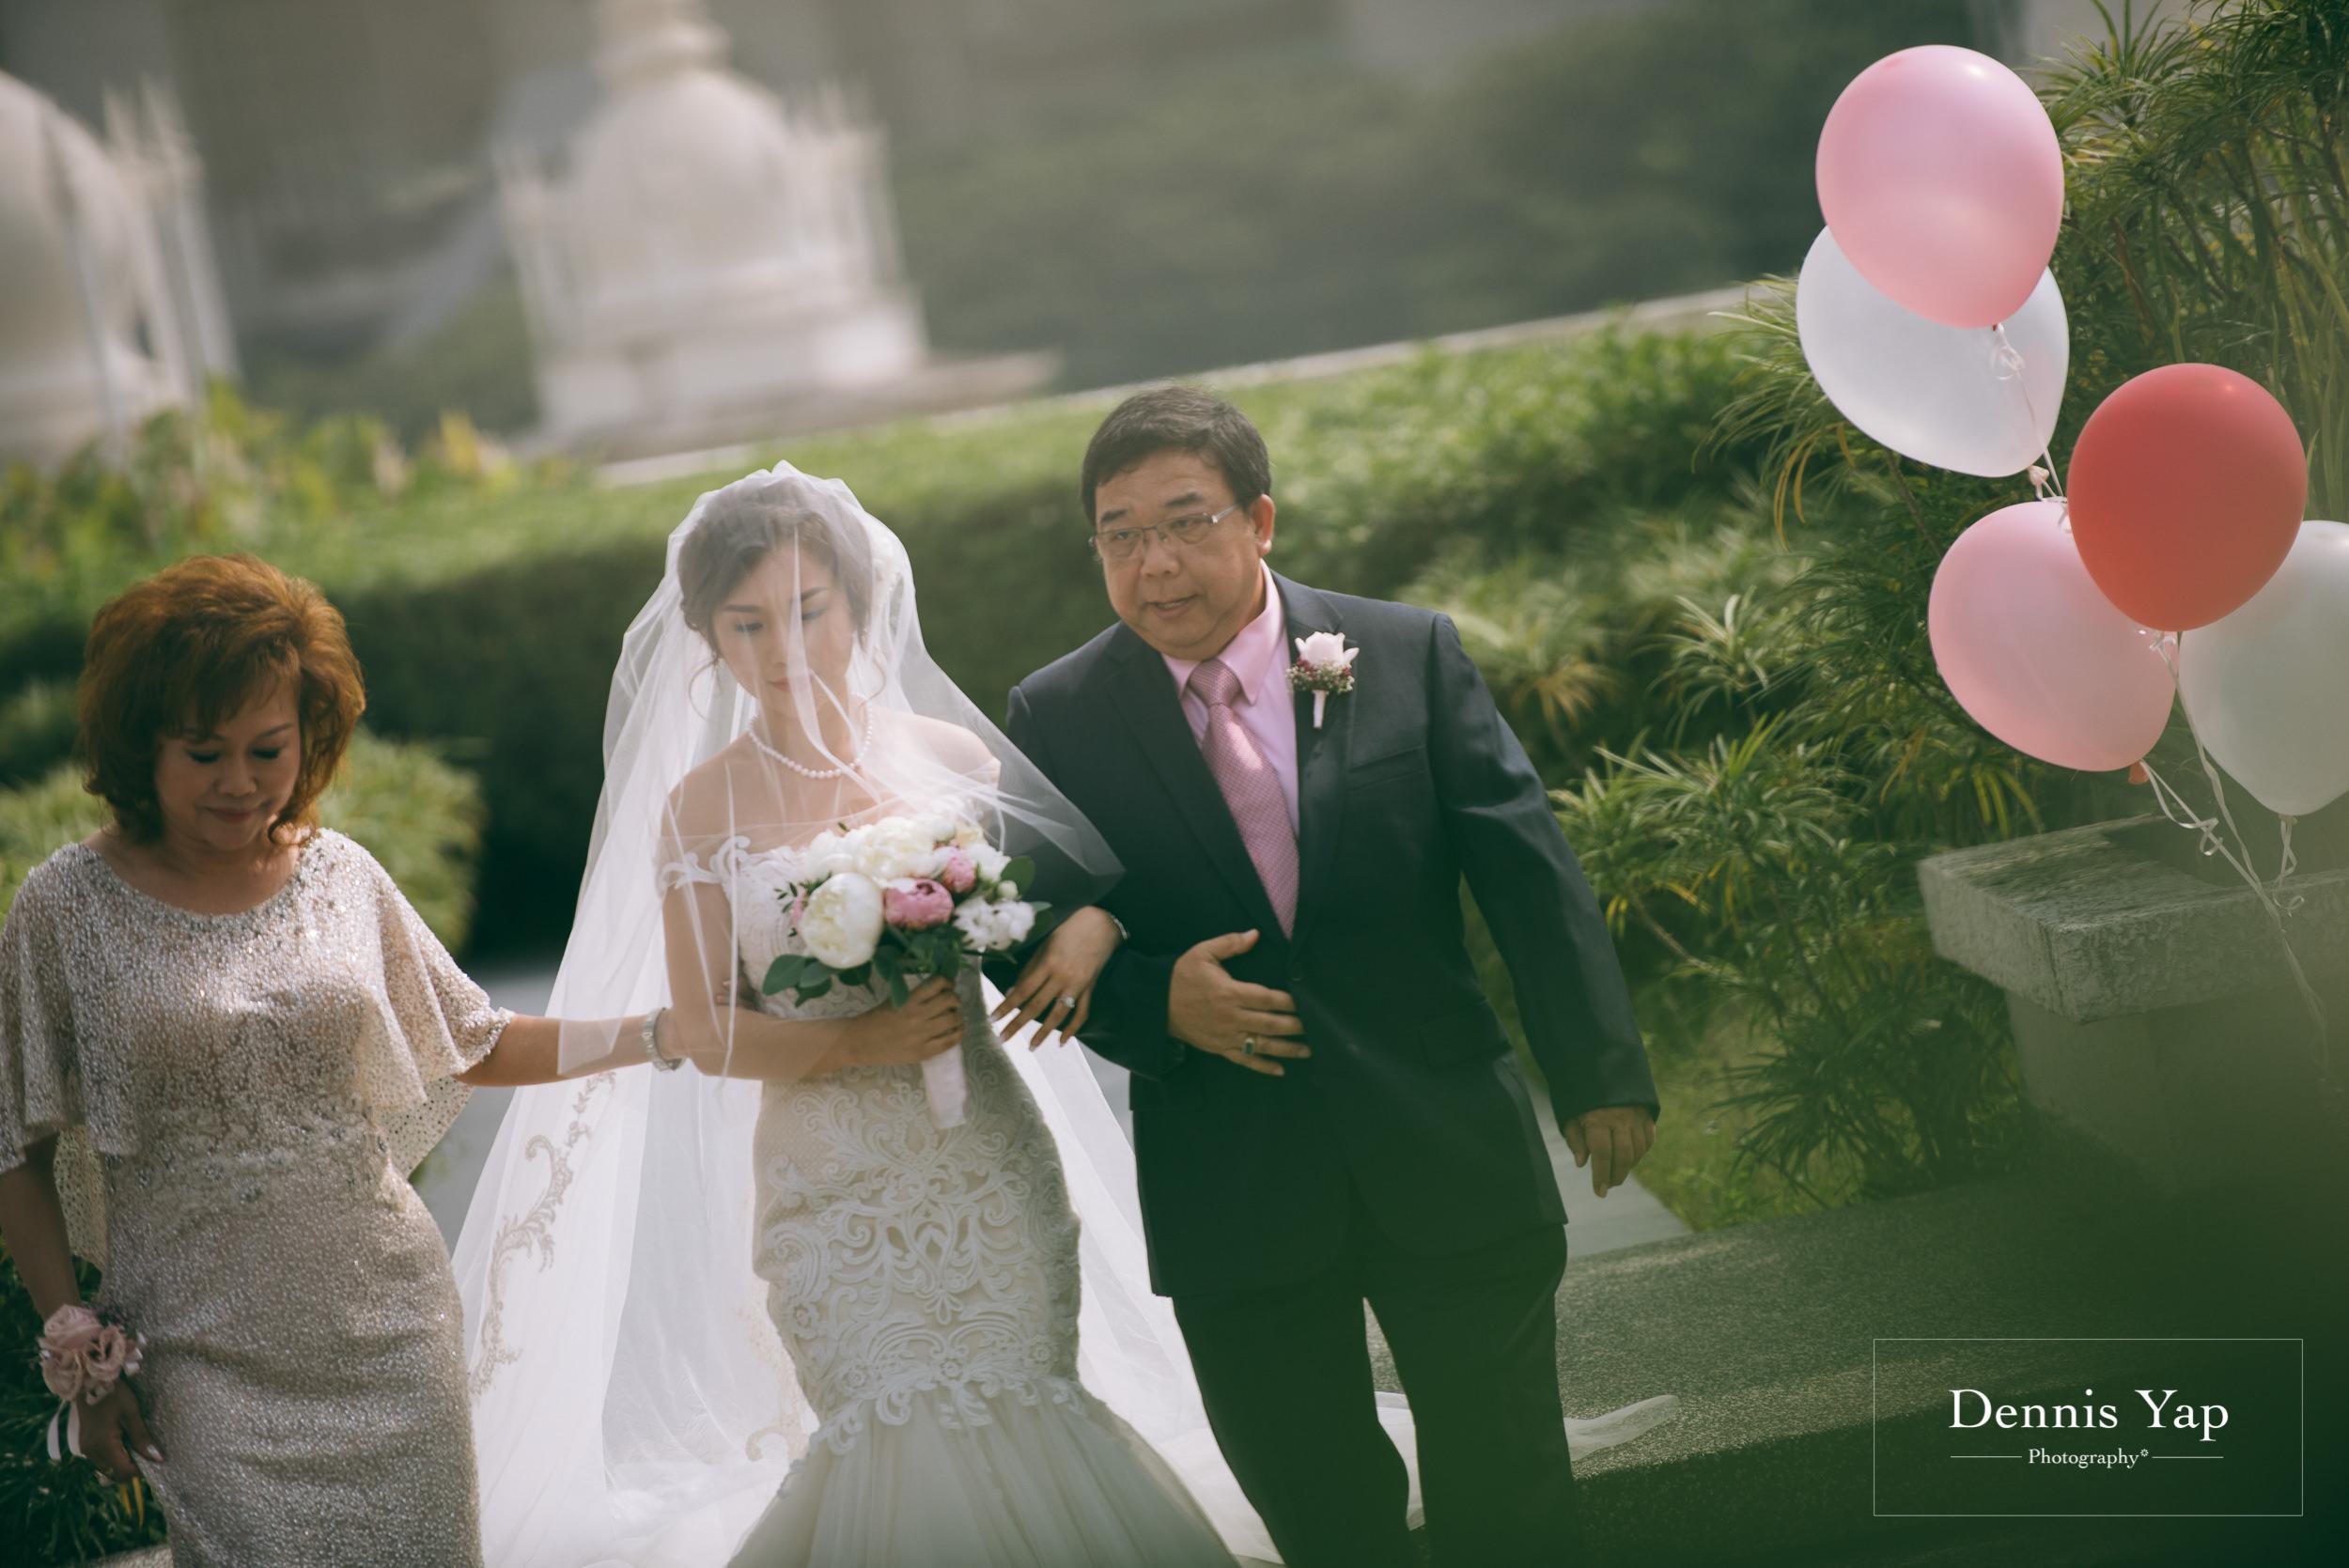 lionel joanne garden wedding majestic hotel dennis yap photography malaysia top wedding photographer-31.jpg